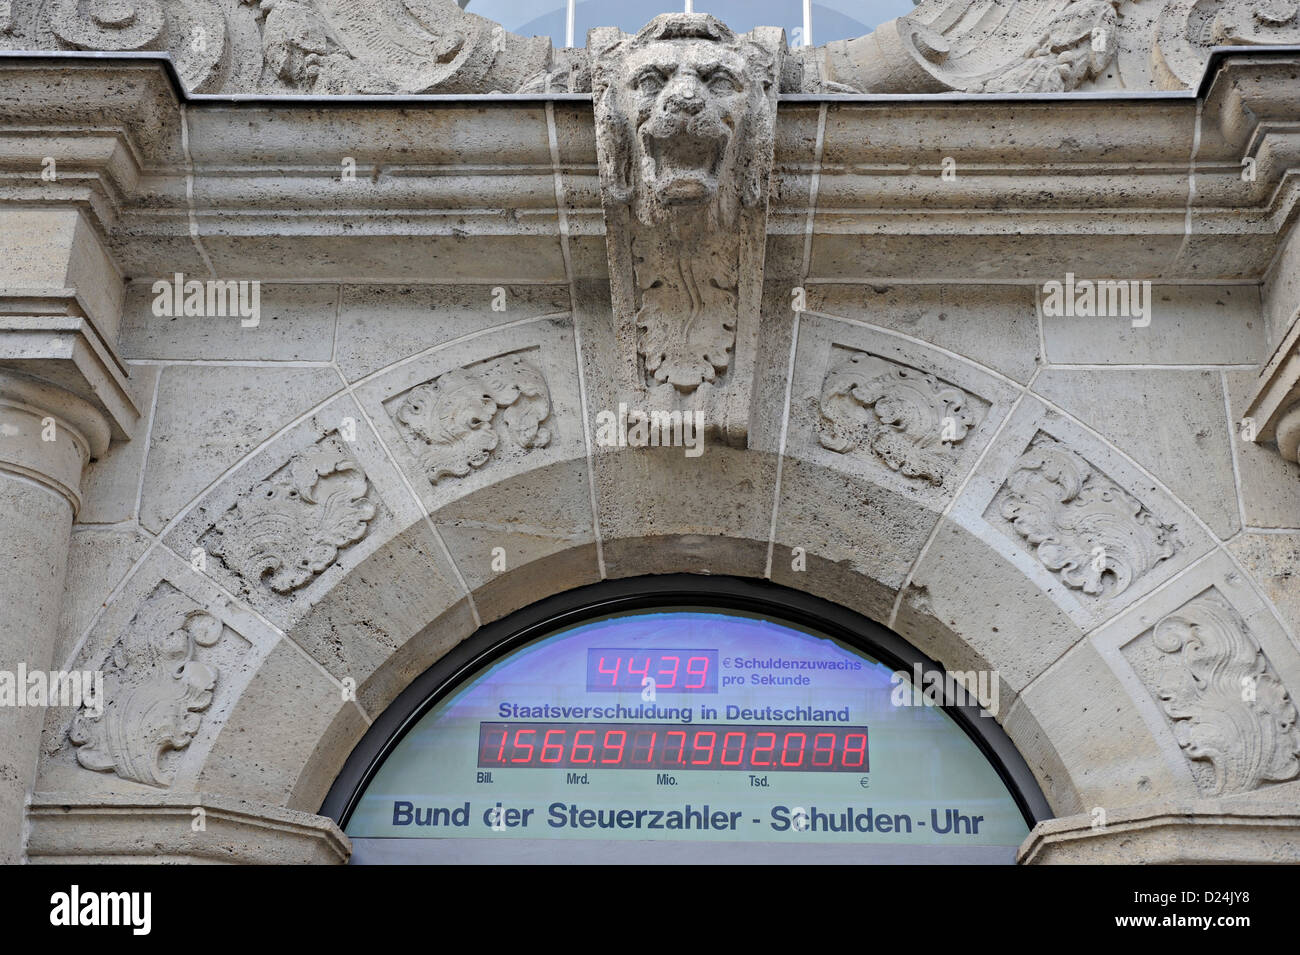 Schuldenstand Berlin